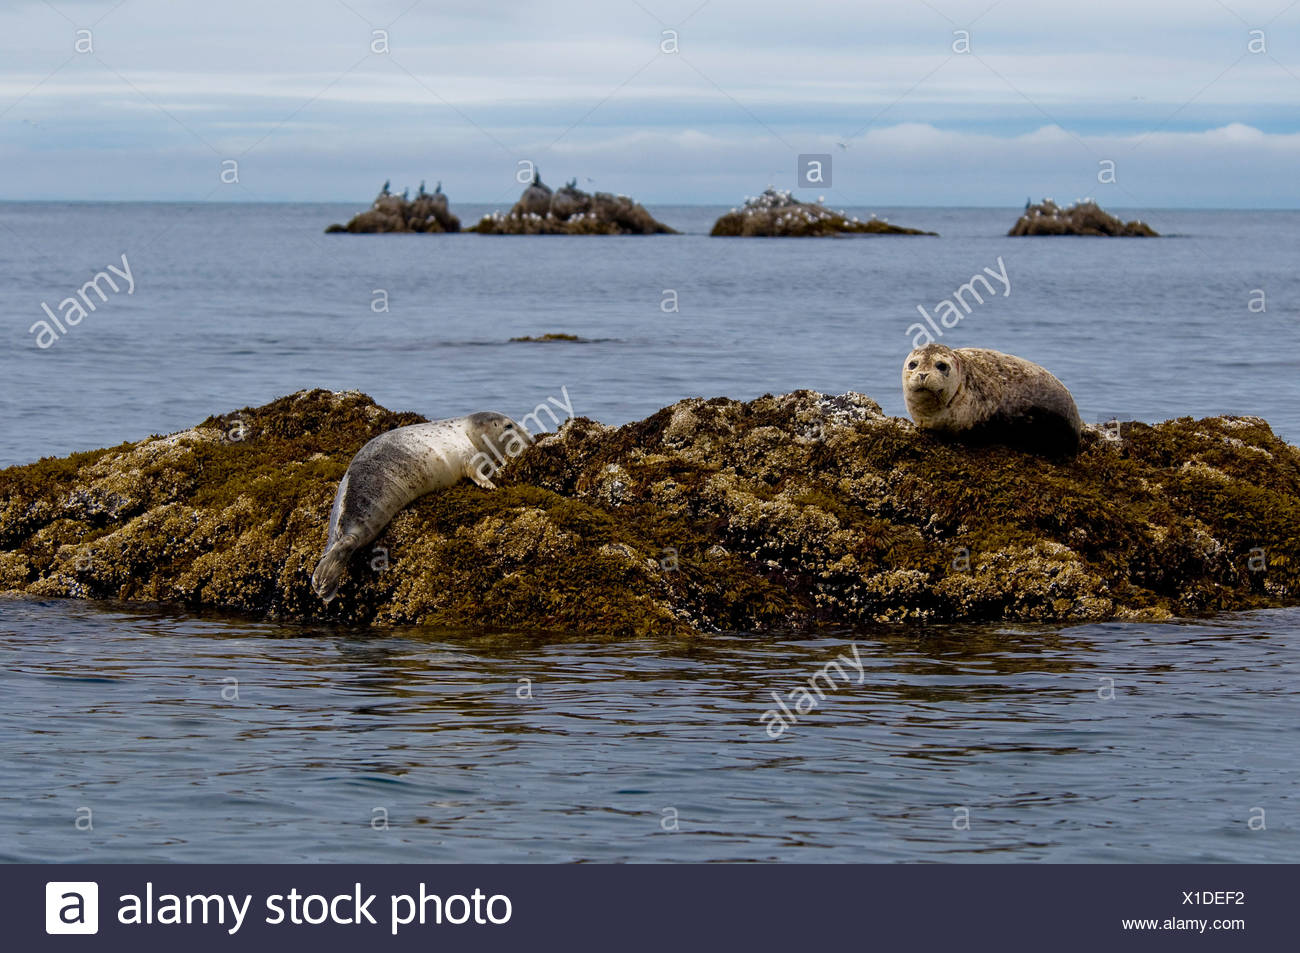 Two Harbor seals rest on a rock off the shore of  Kukak Bay, Katmai National Park, Alaska, Summer Stock Photo